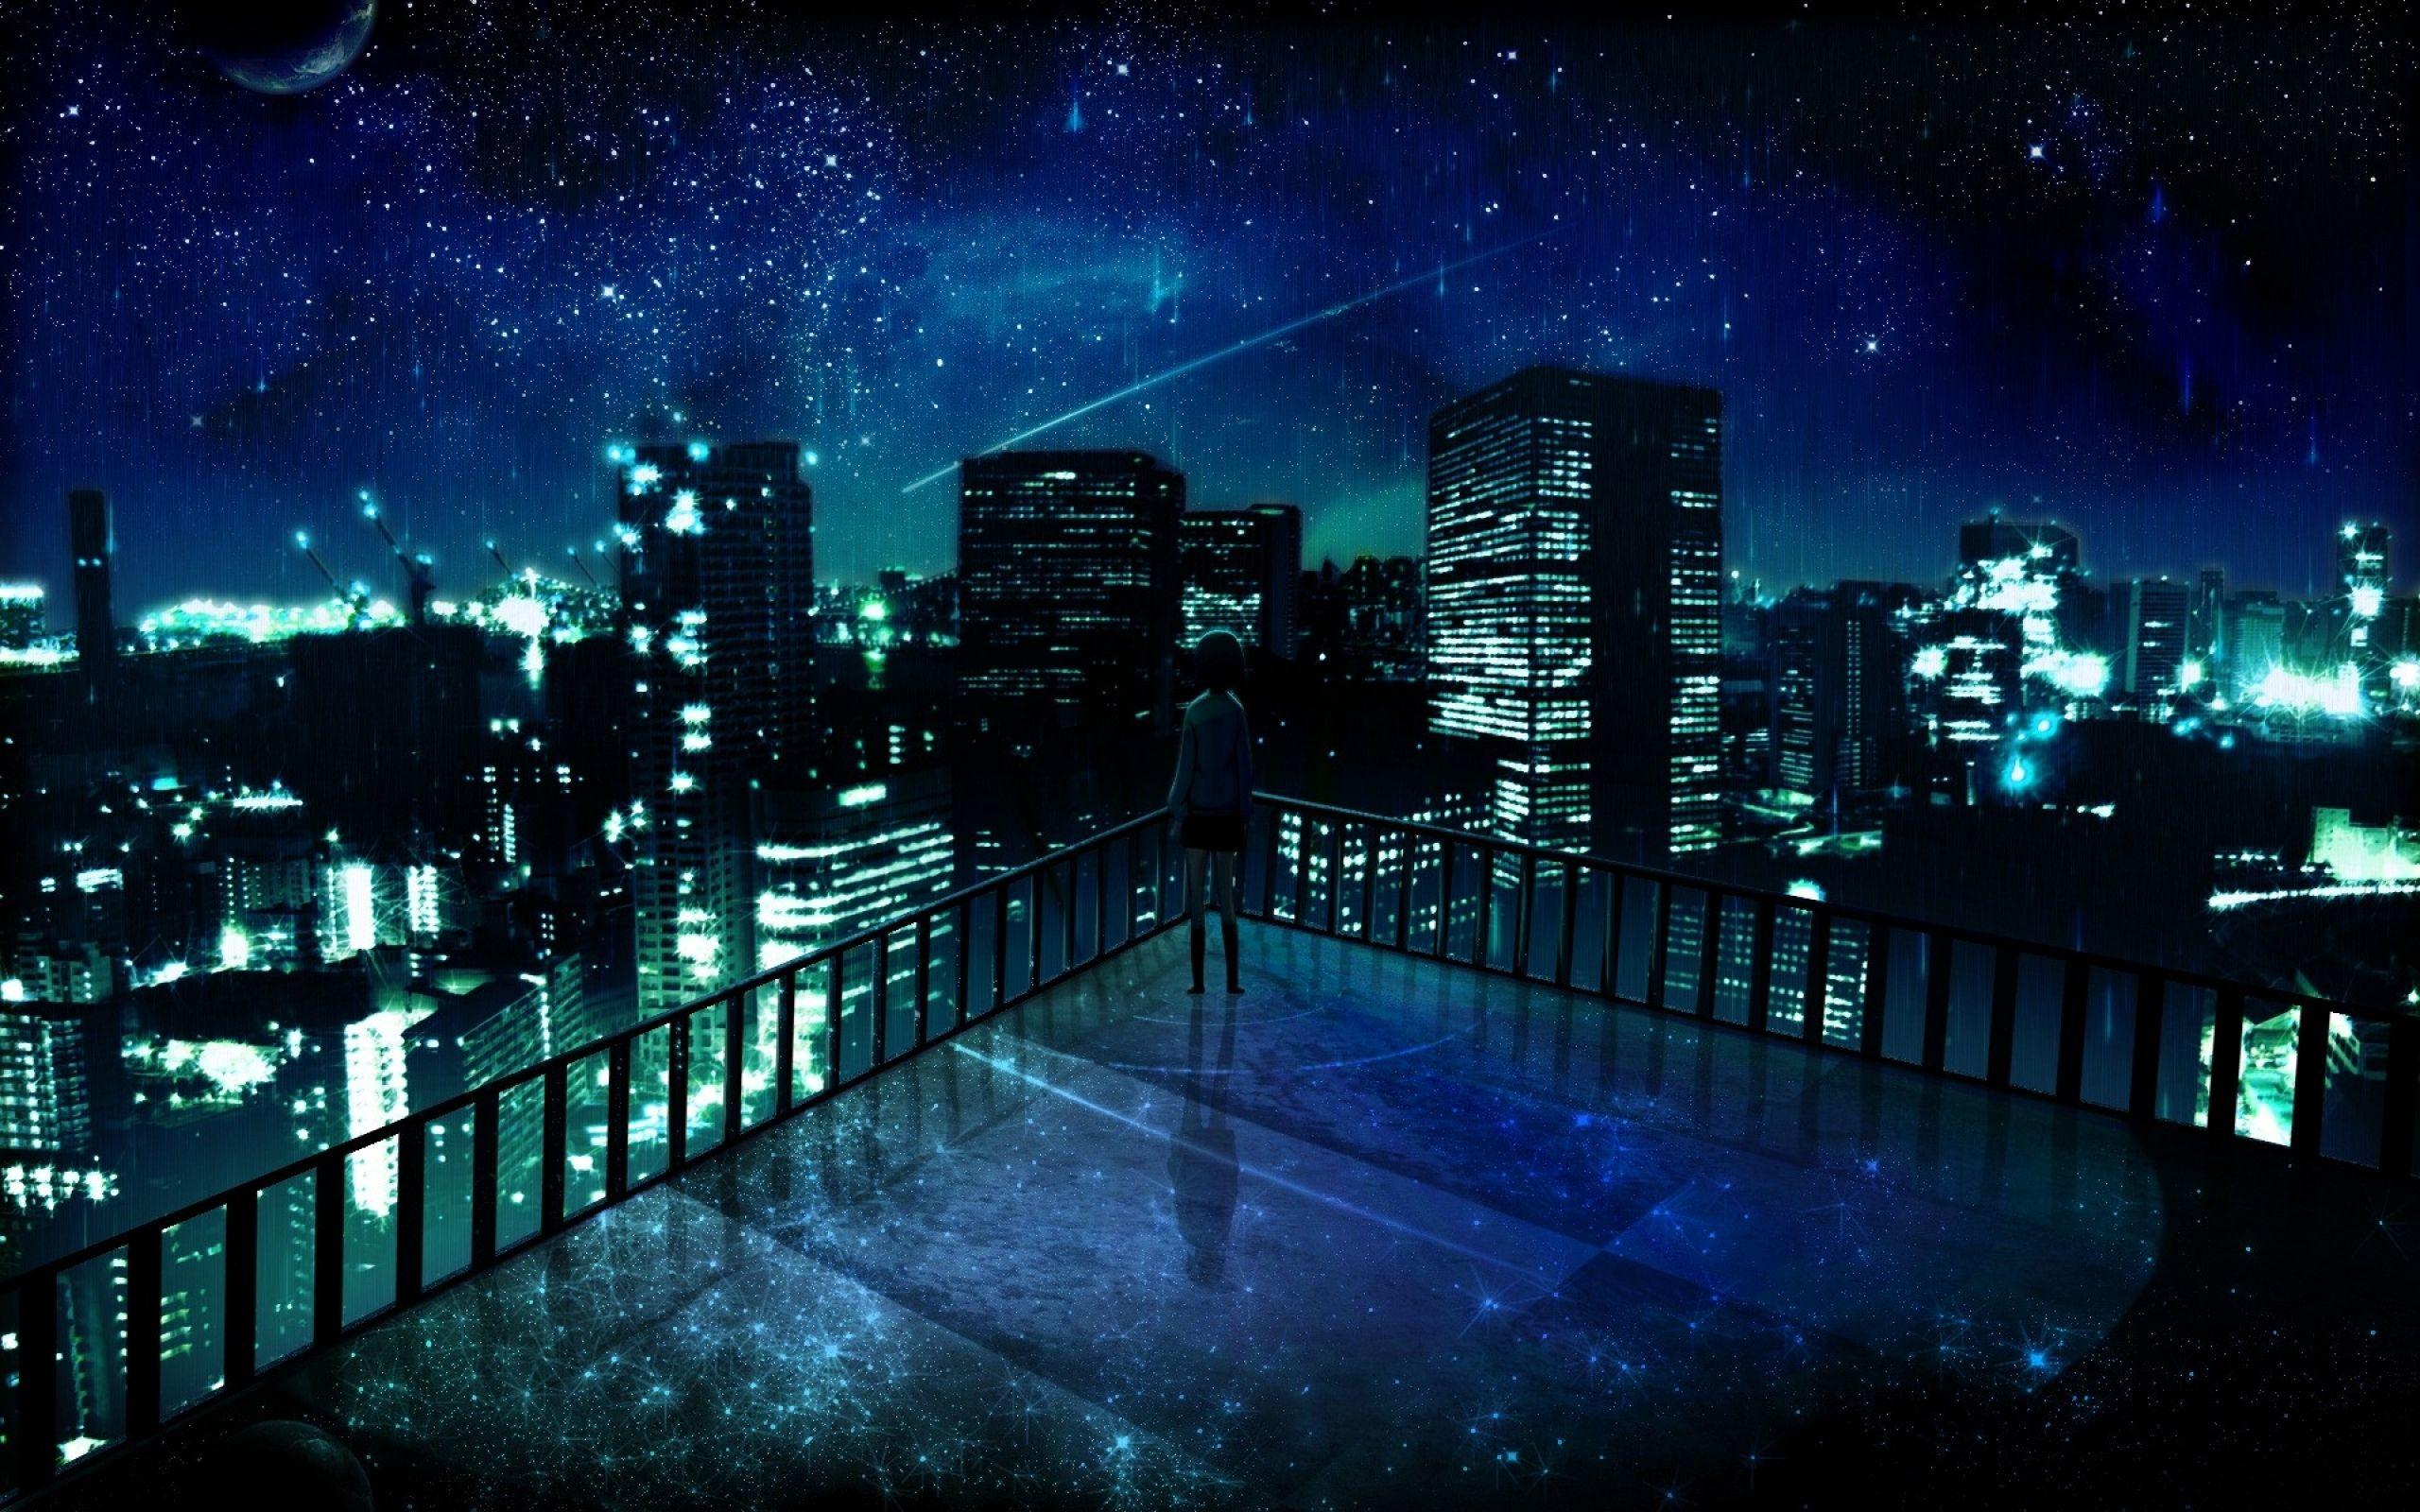 Night City Anime Wallpaper Desktop 72722 Wallpaper Anime Scenery